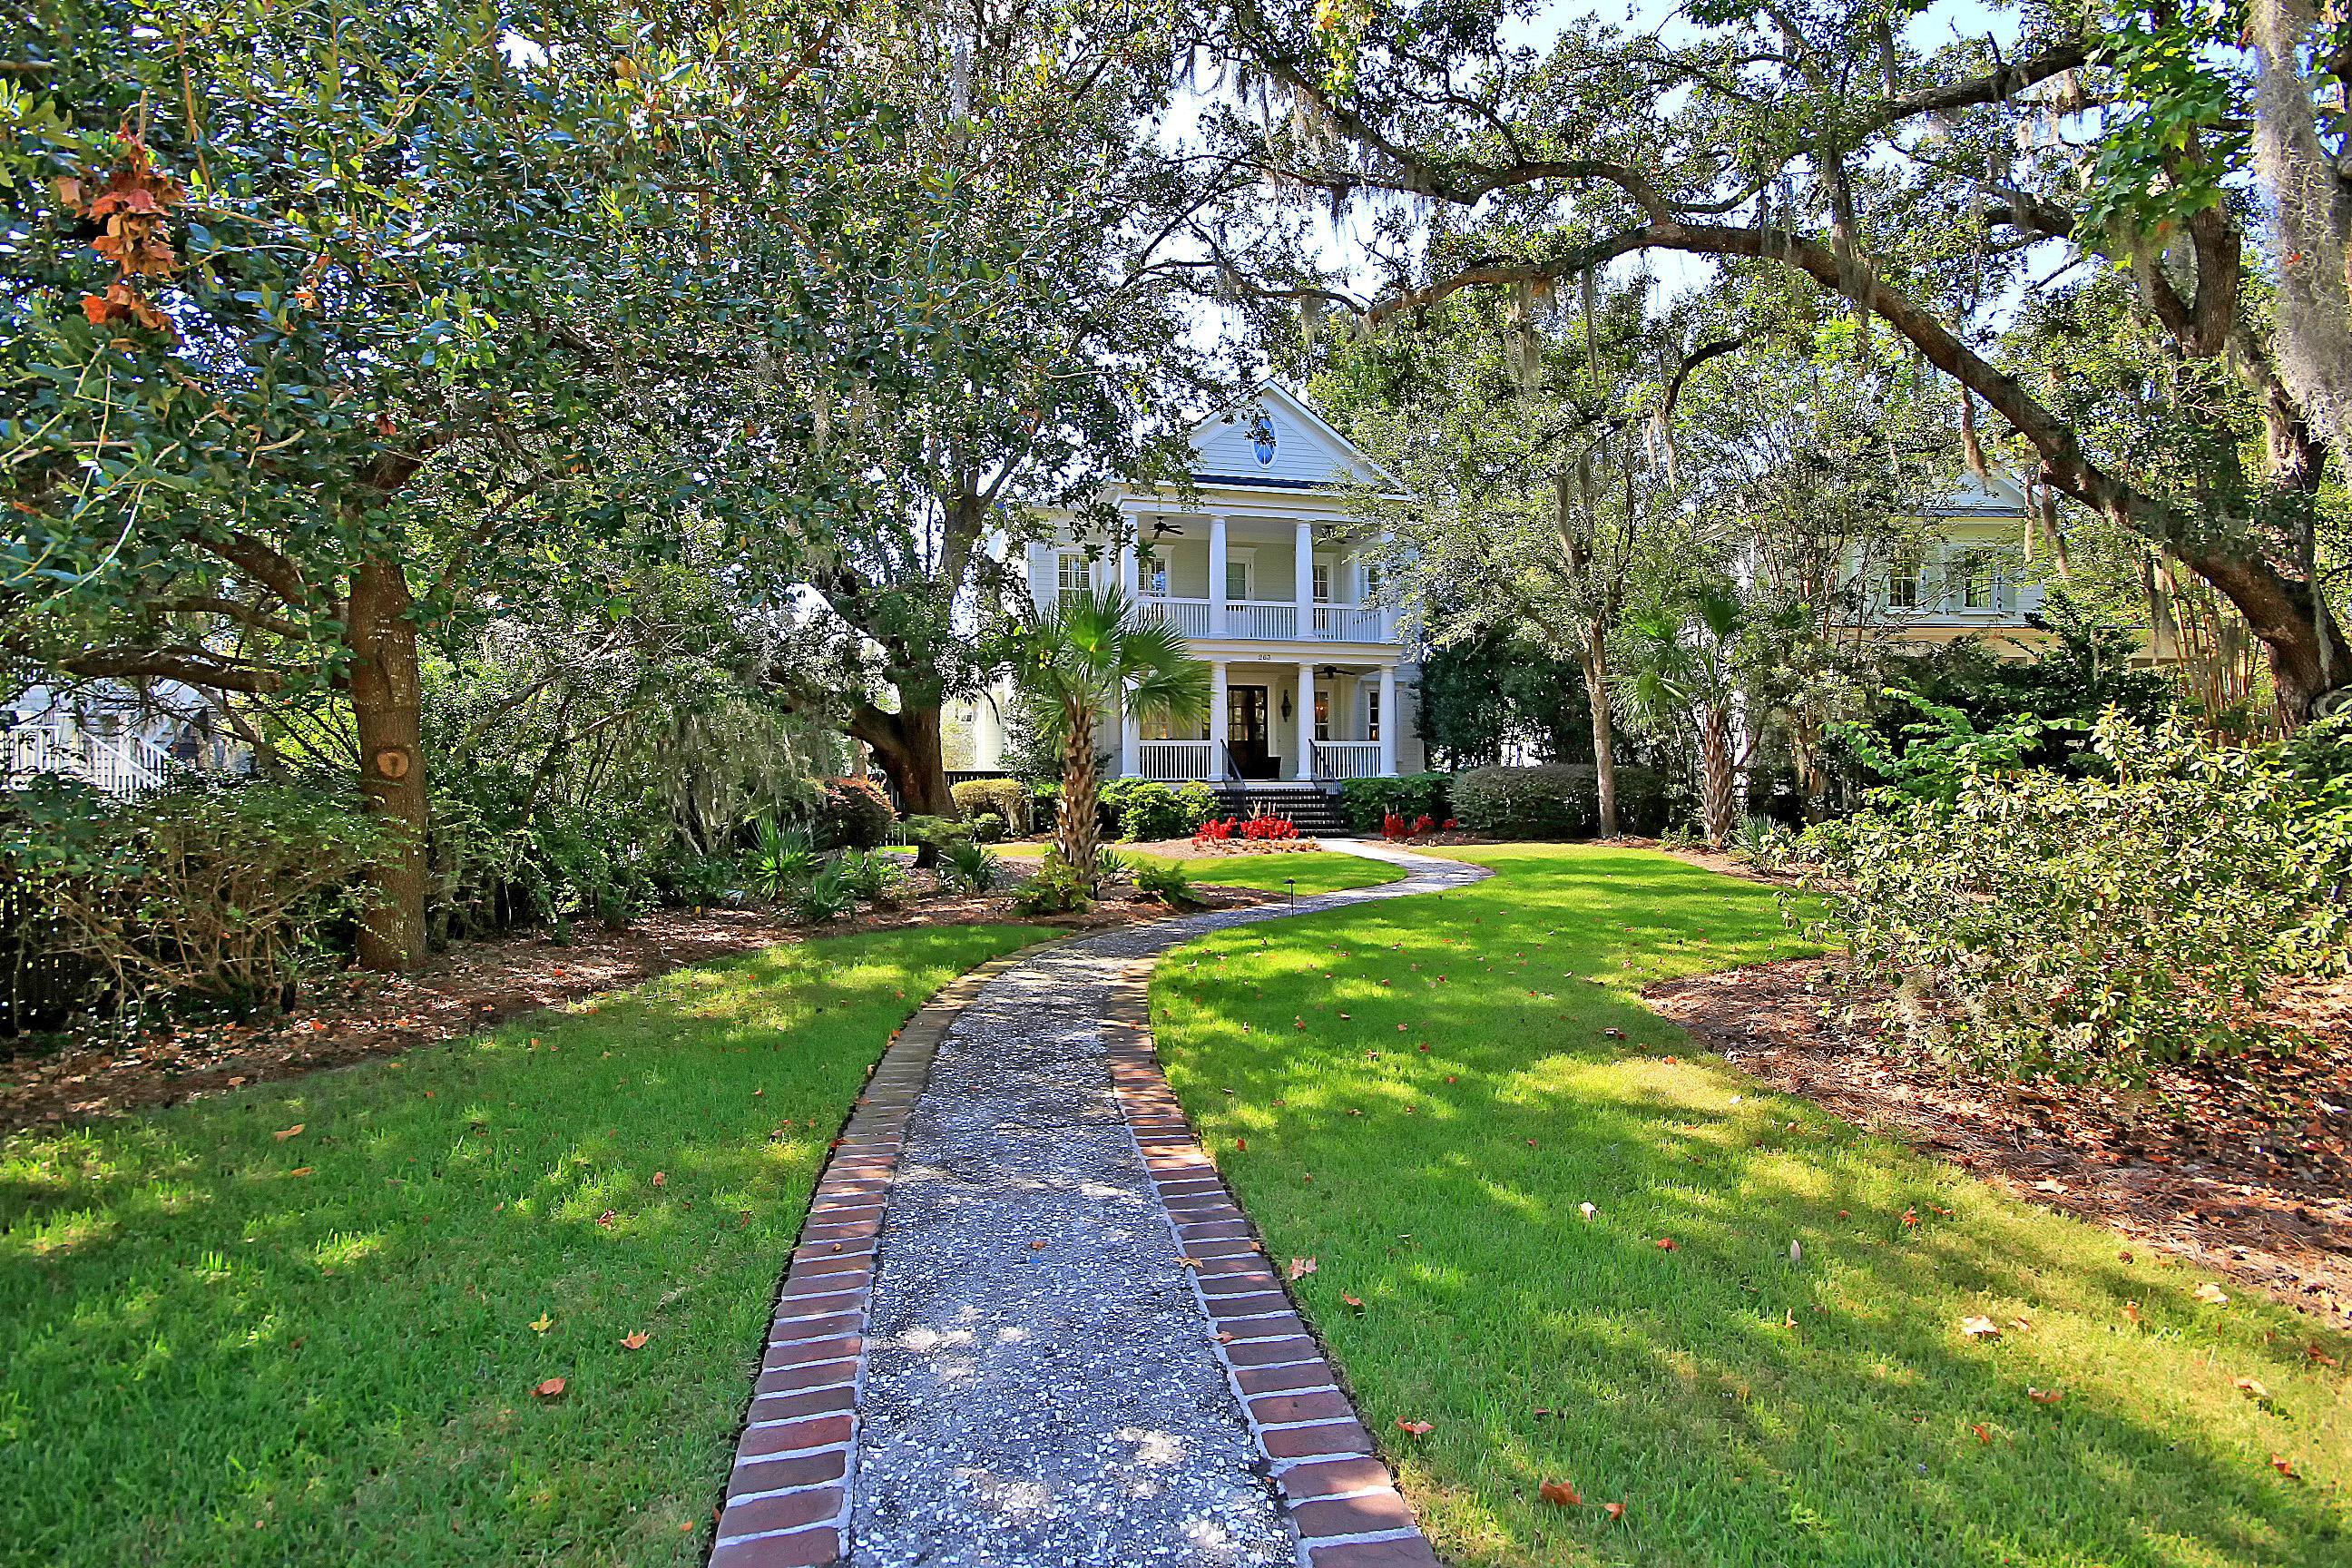 Daniel Island Homes For Sale - 263 Delahow, Daniel Island, SC - 33